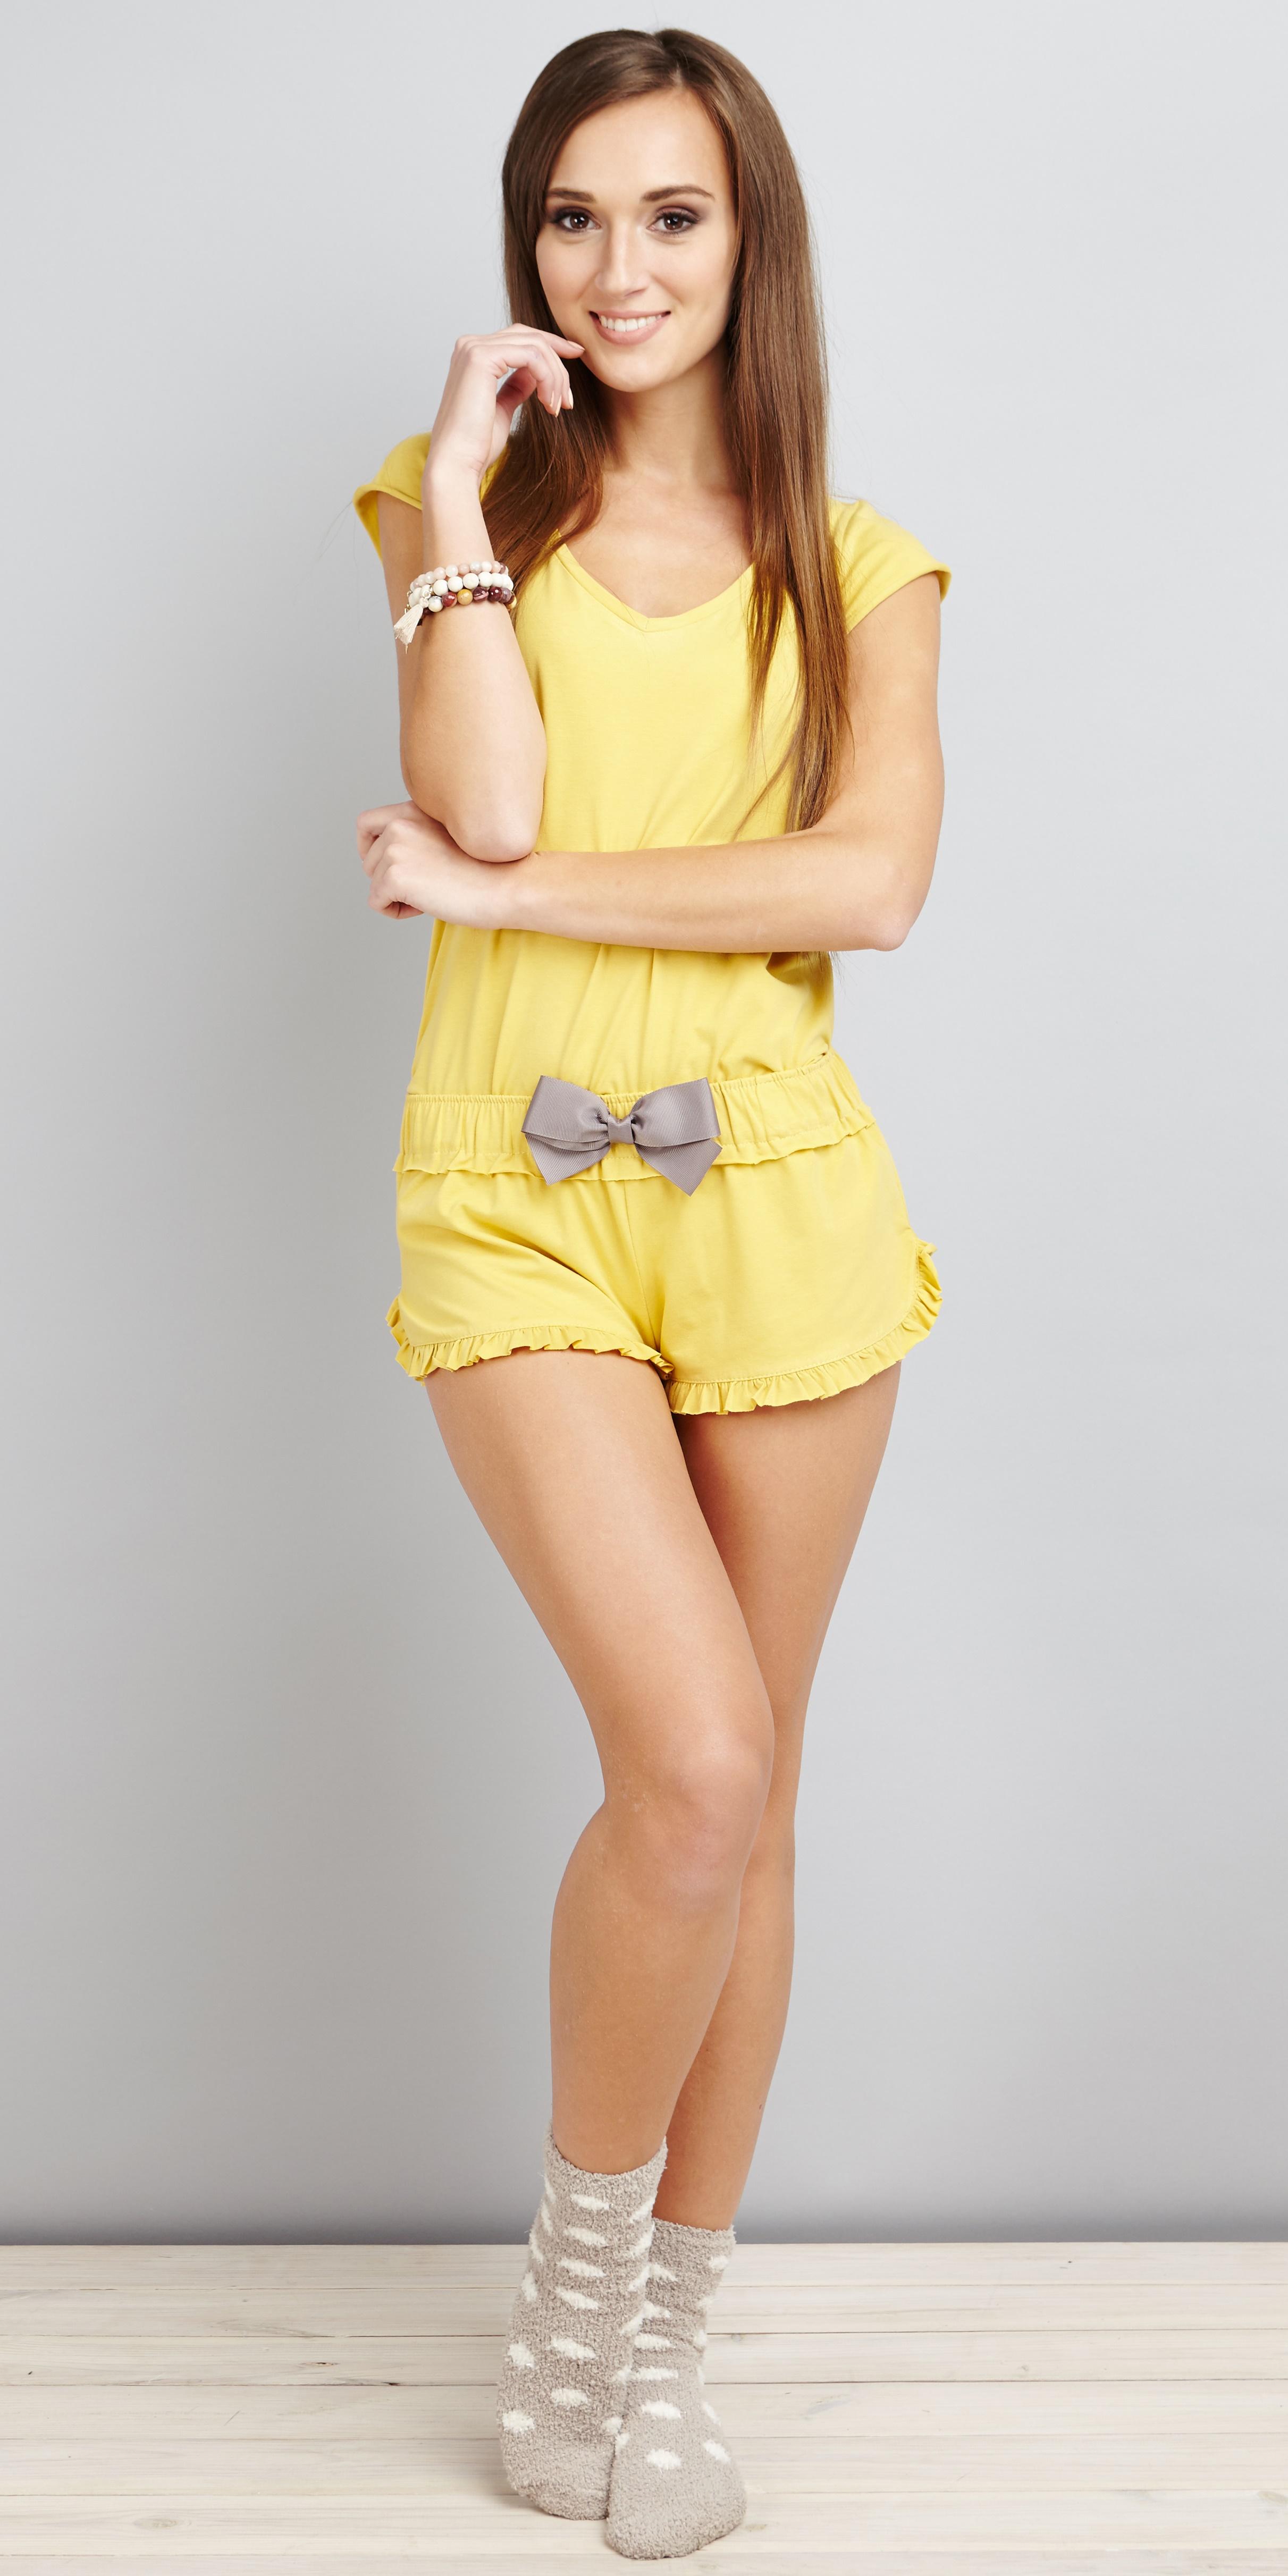 b997fdfea6f6d3 Piżama MISTY SUN MKK106 Makashi- sklep internetowy E-lady.pl